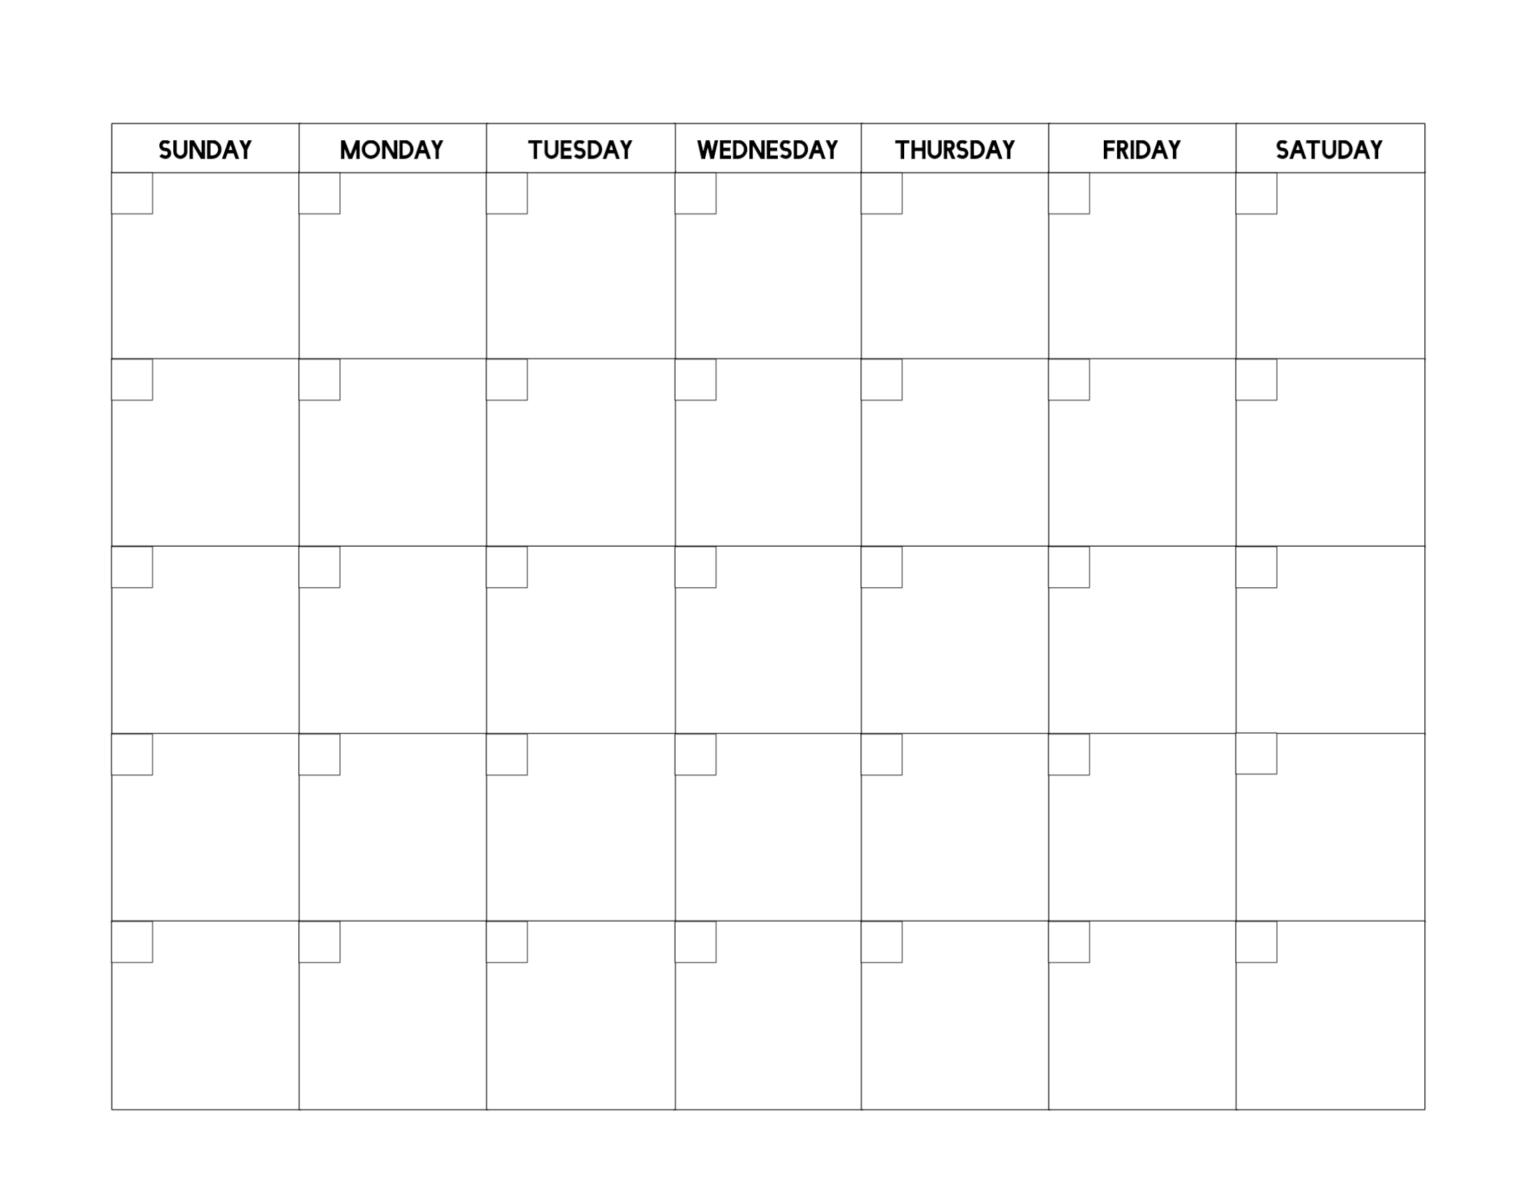 Free Printable Blank Calendar Templates - Dalep.midnightpig  Printable Full Page Blank Calendar Template